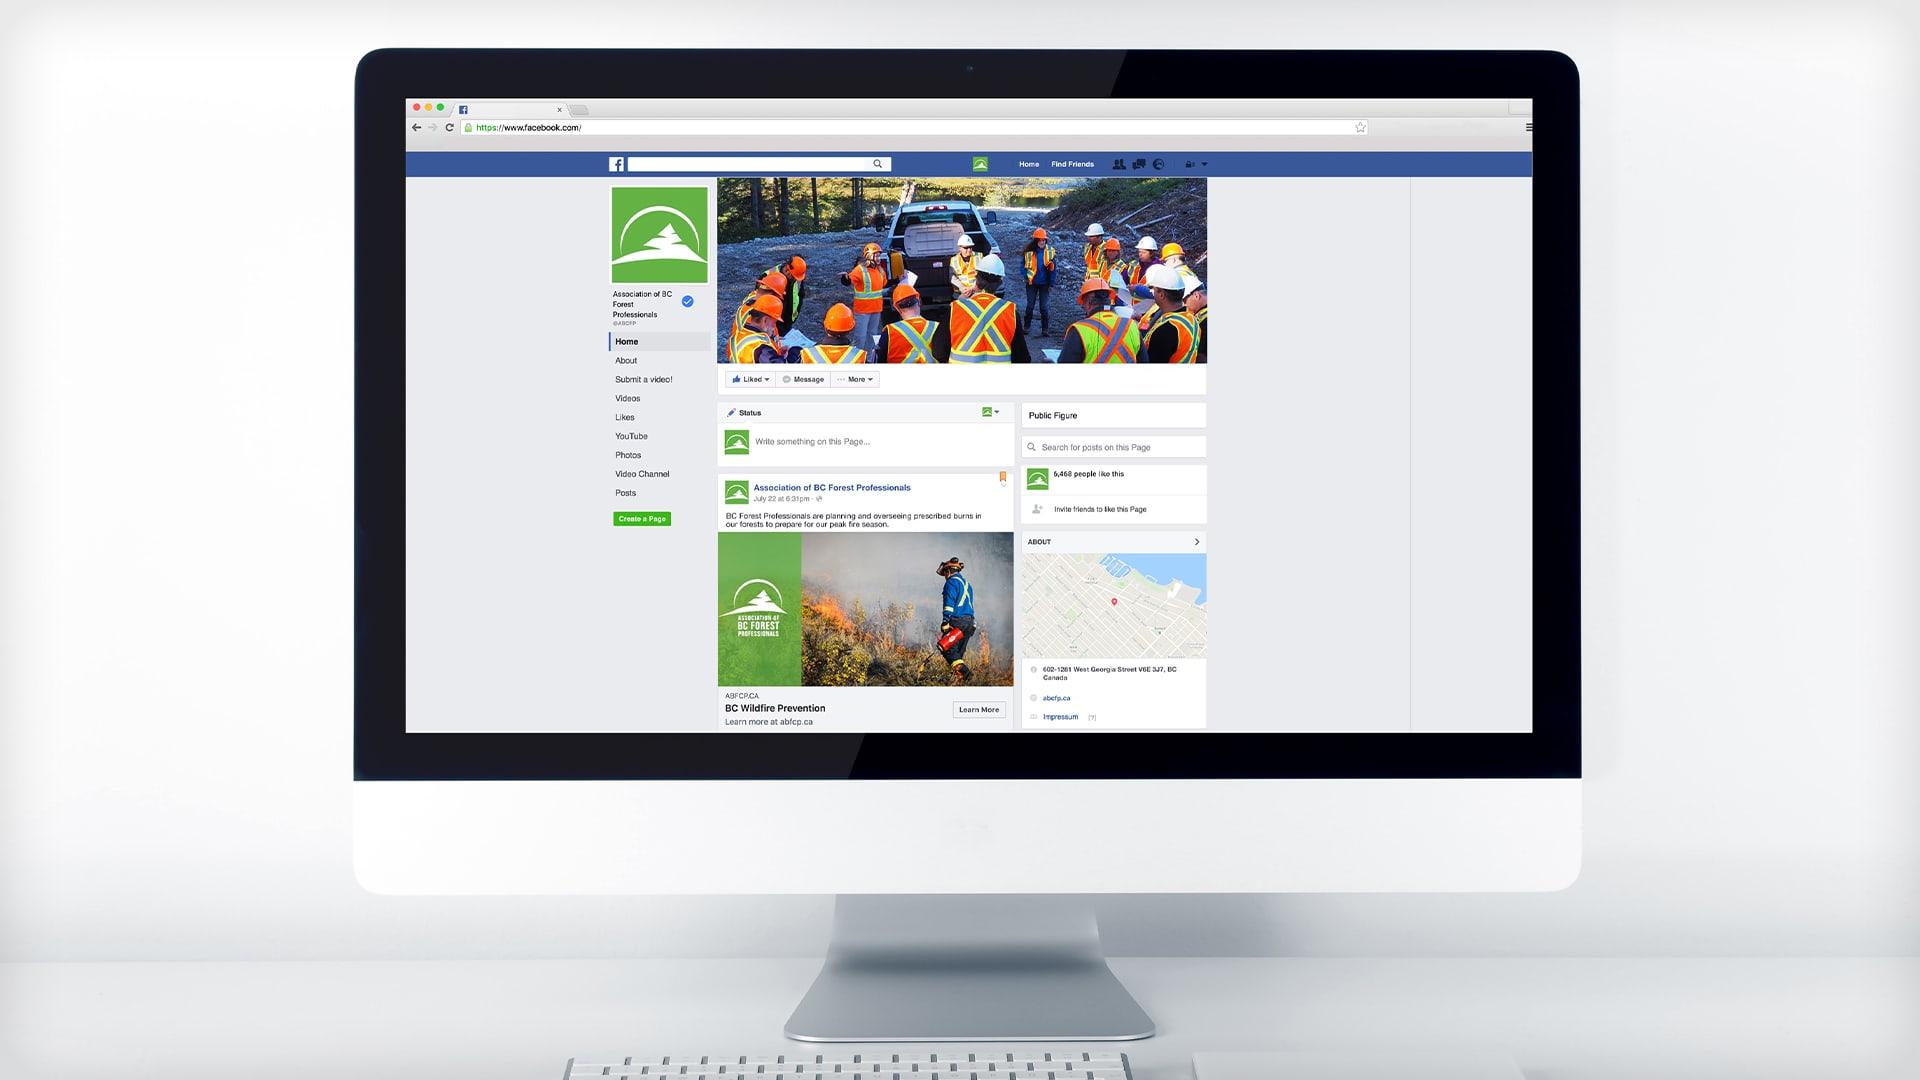 ABCFP Digital campaign facebook mockup